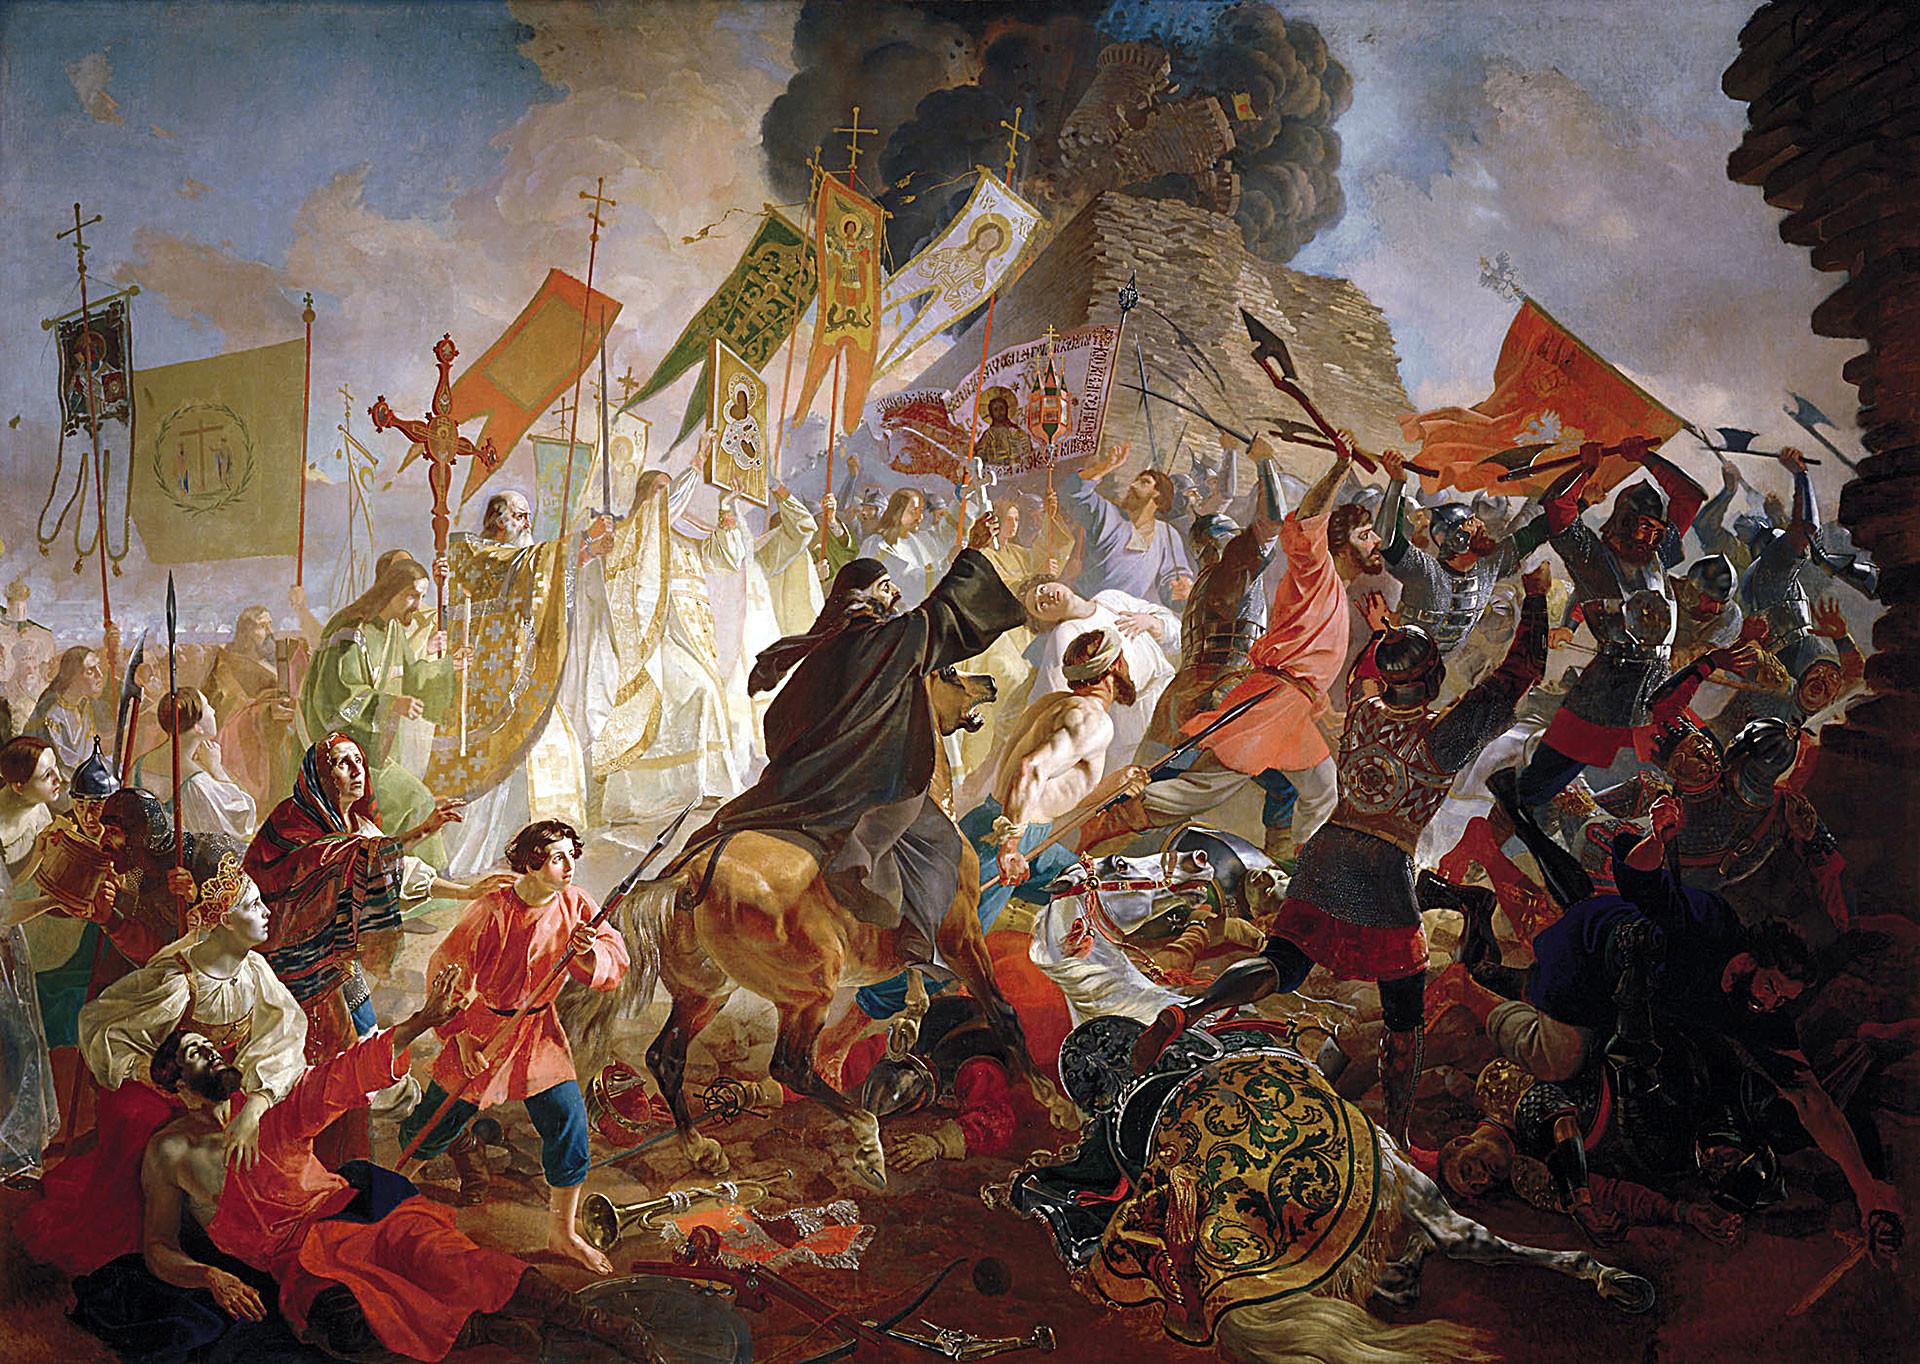 Karl Briullov. Siege of Pskov by Polish King Stefan Batory', 1843.